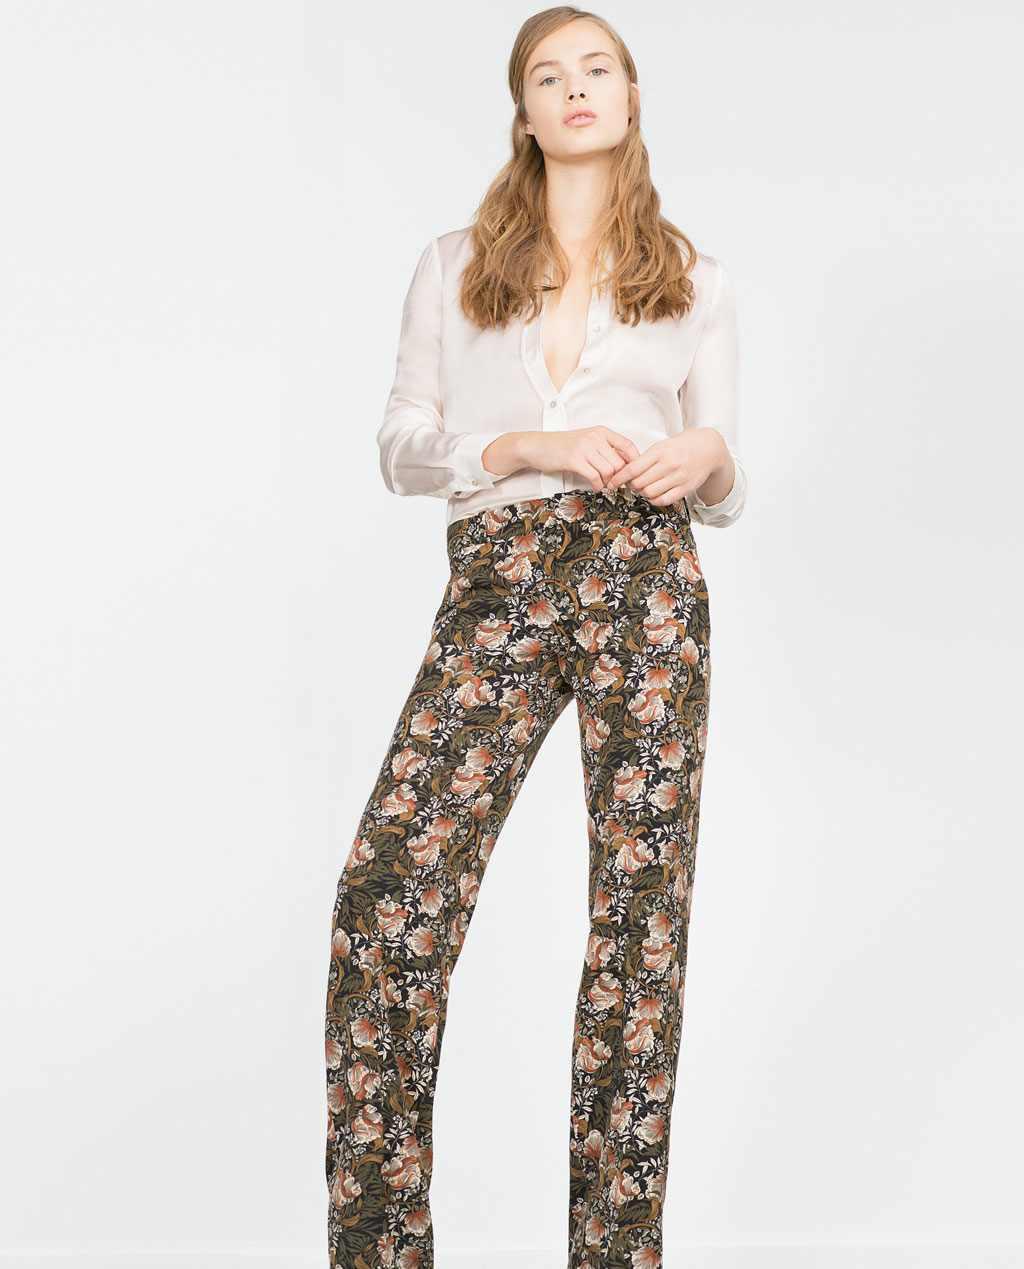 Zara - pantalon (50 €)